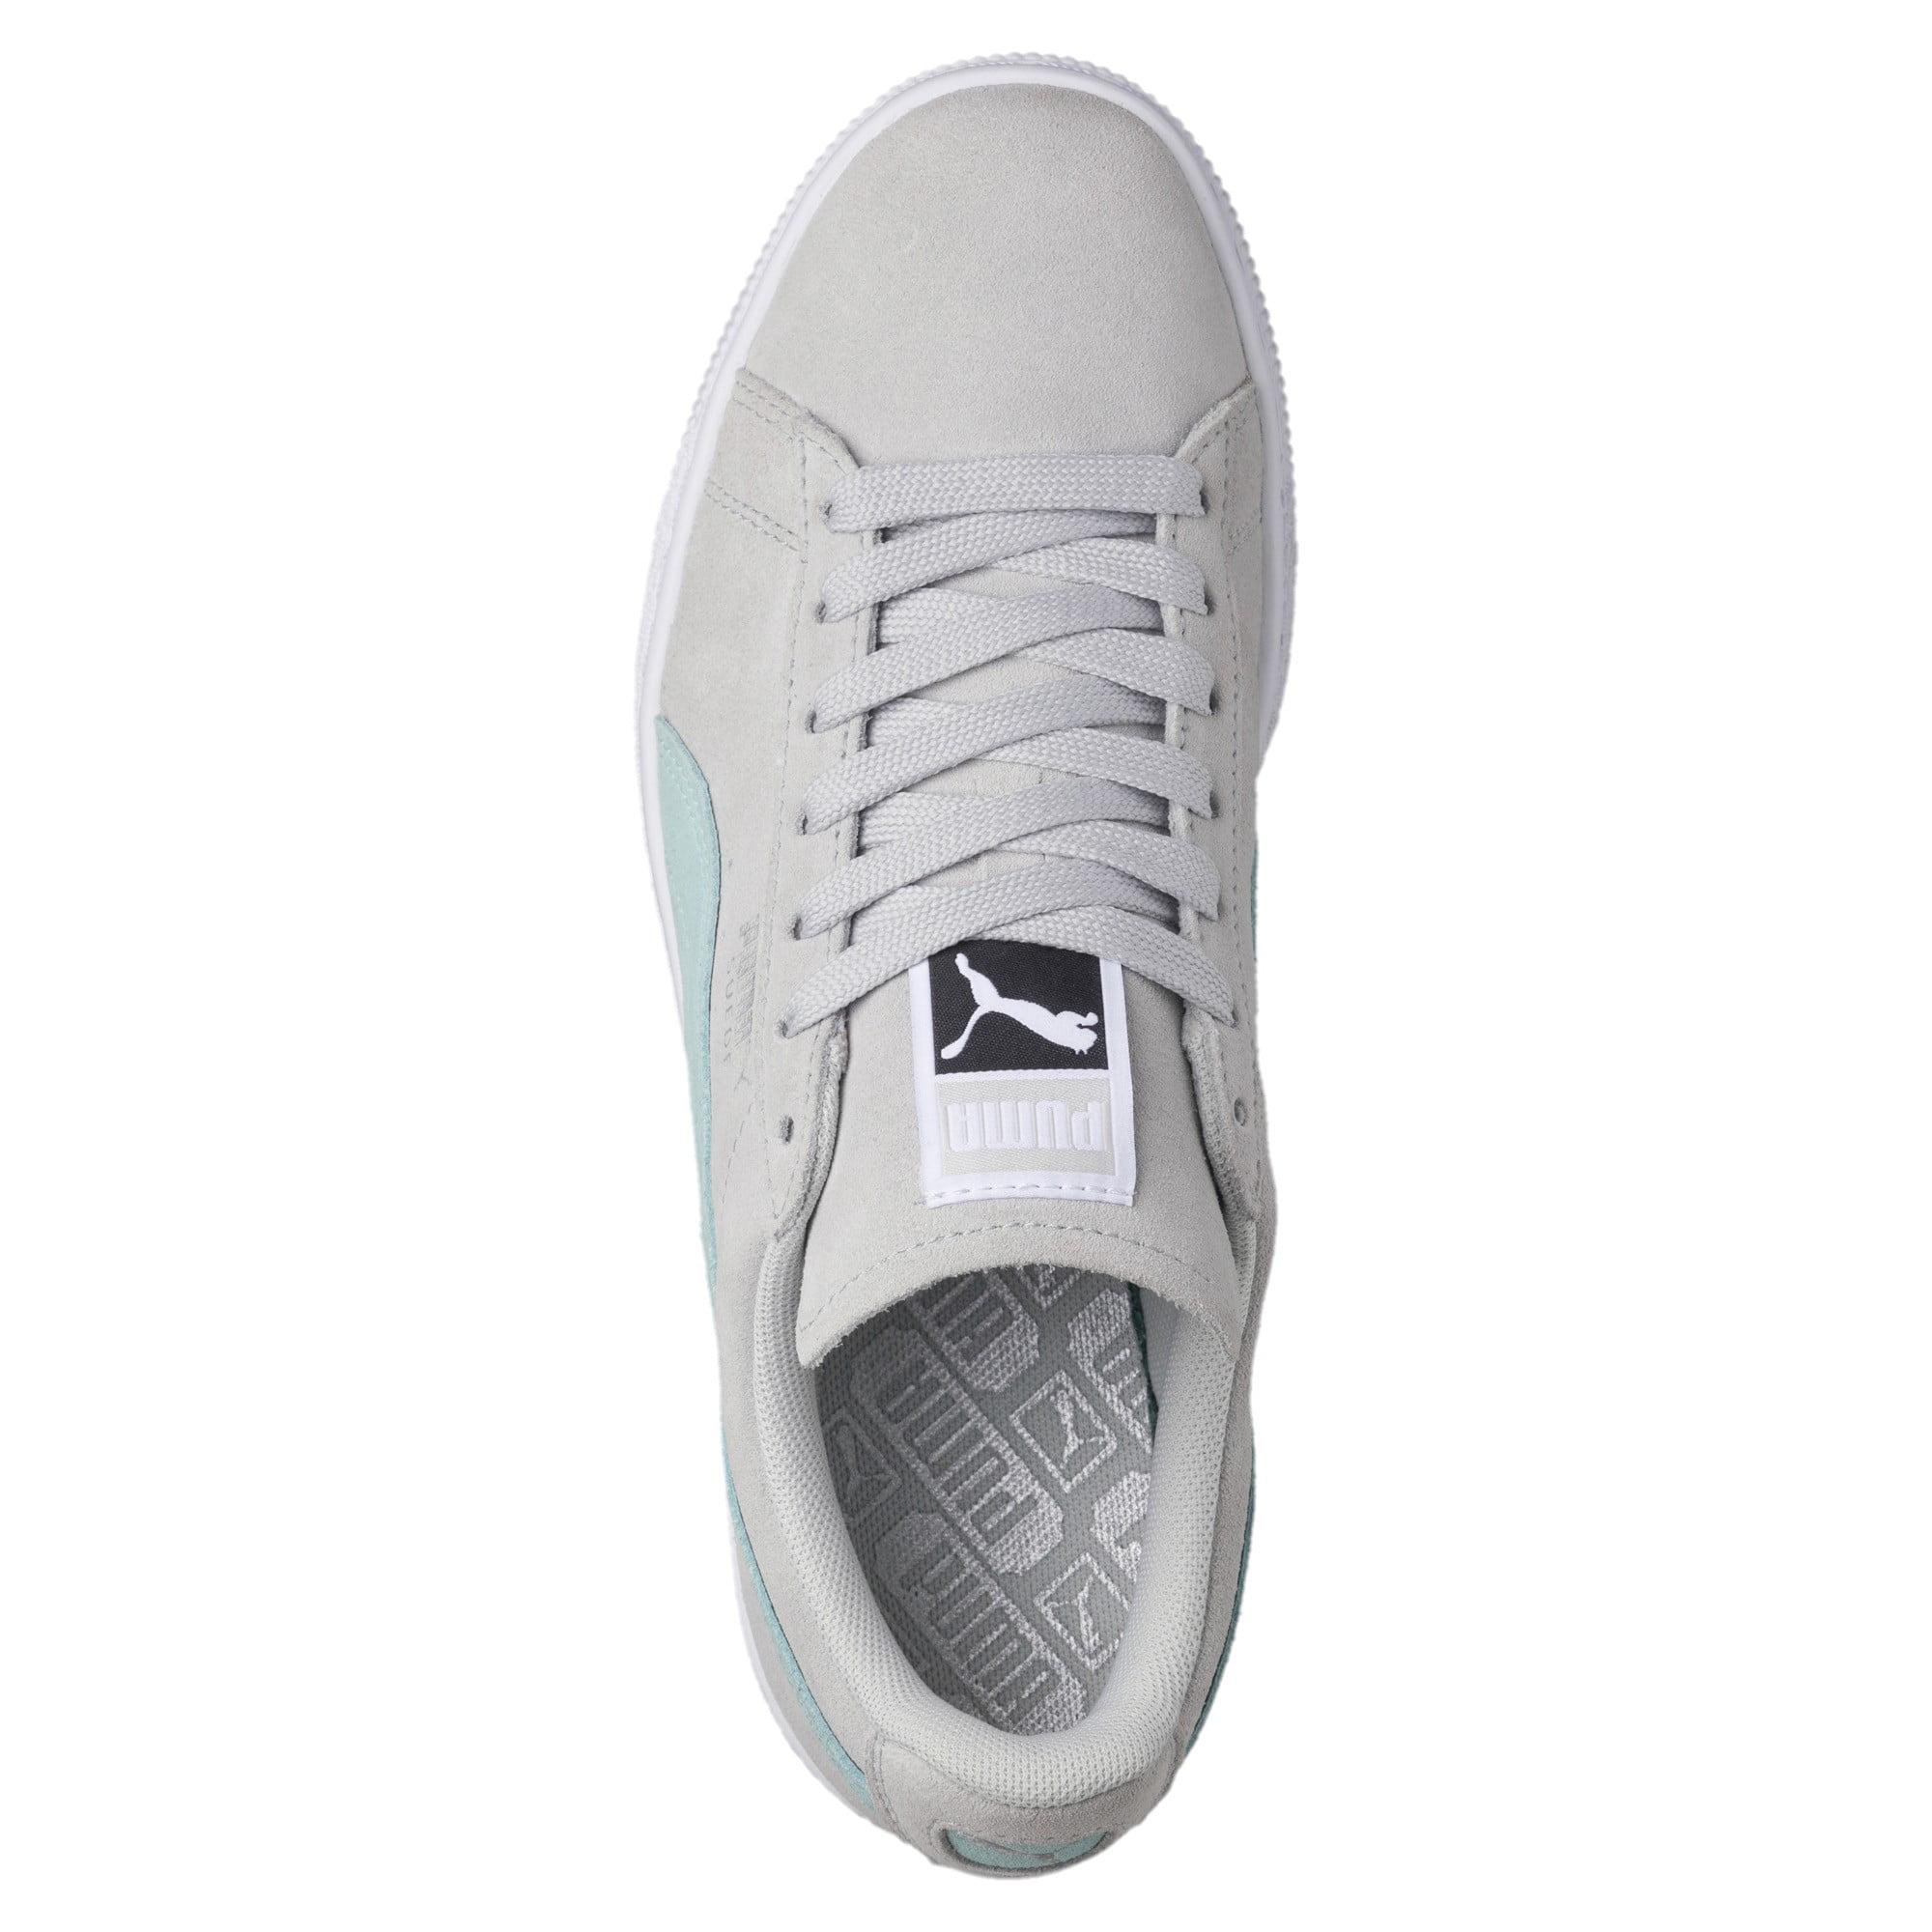 a9de5bb568b134 PUMA - Puma Women s Suede Classic Glacier Gray   Island Paradise Ankle-High  Fashion Sneaker - 9M - Walmart.com